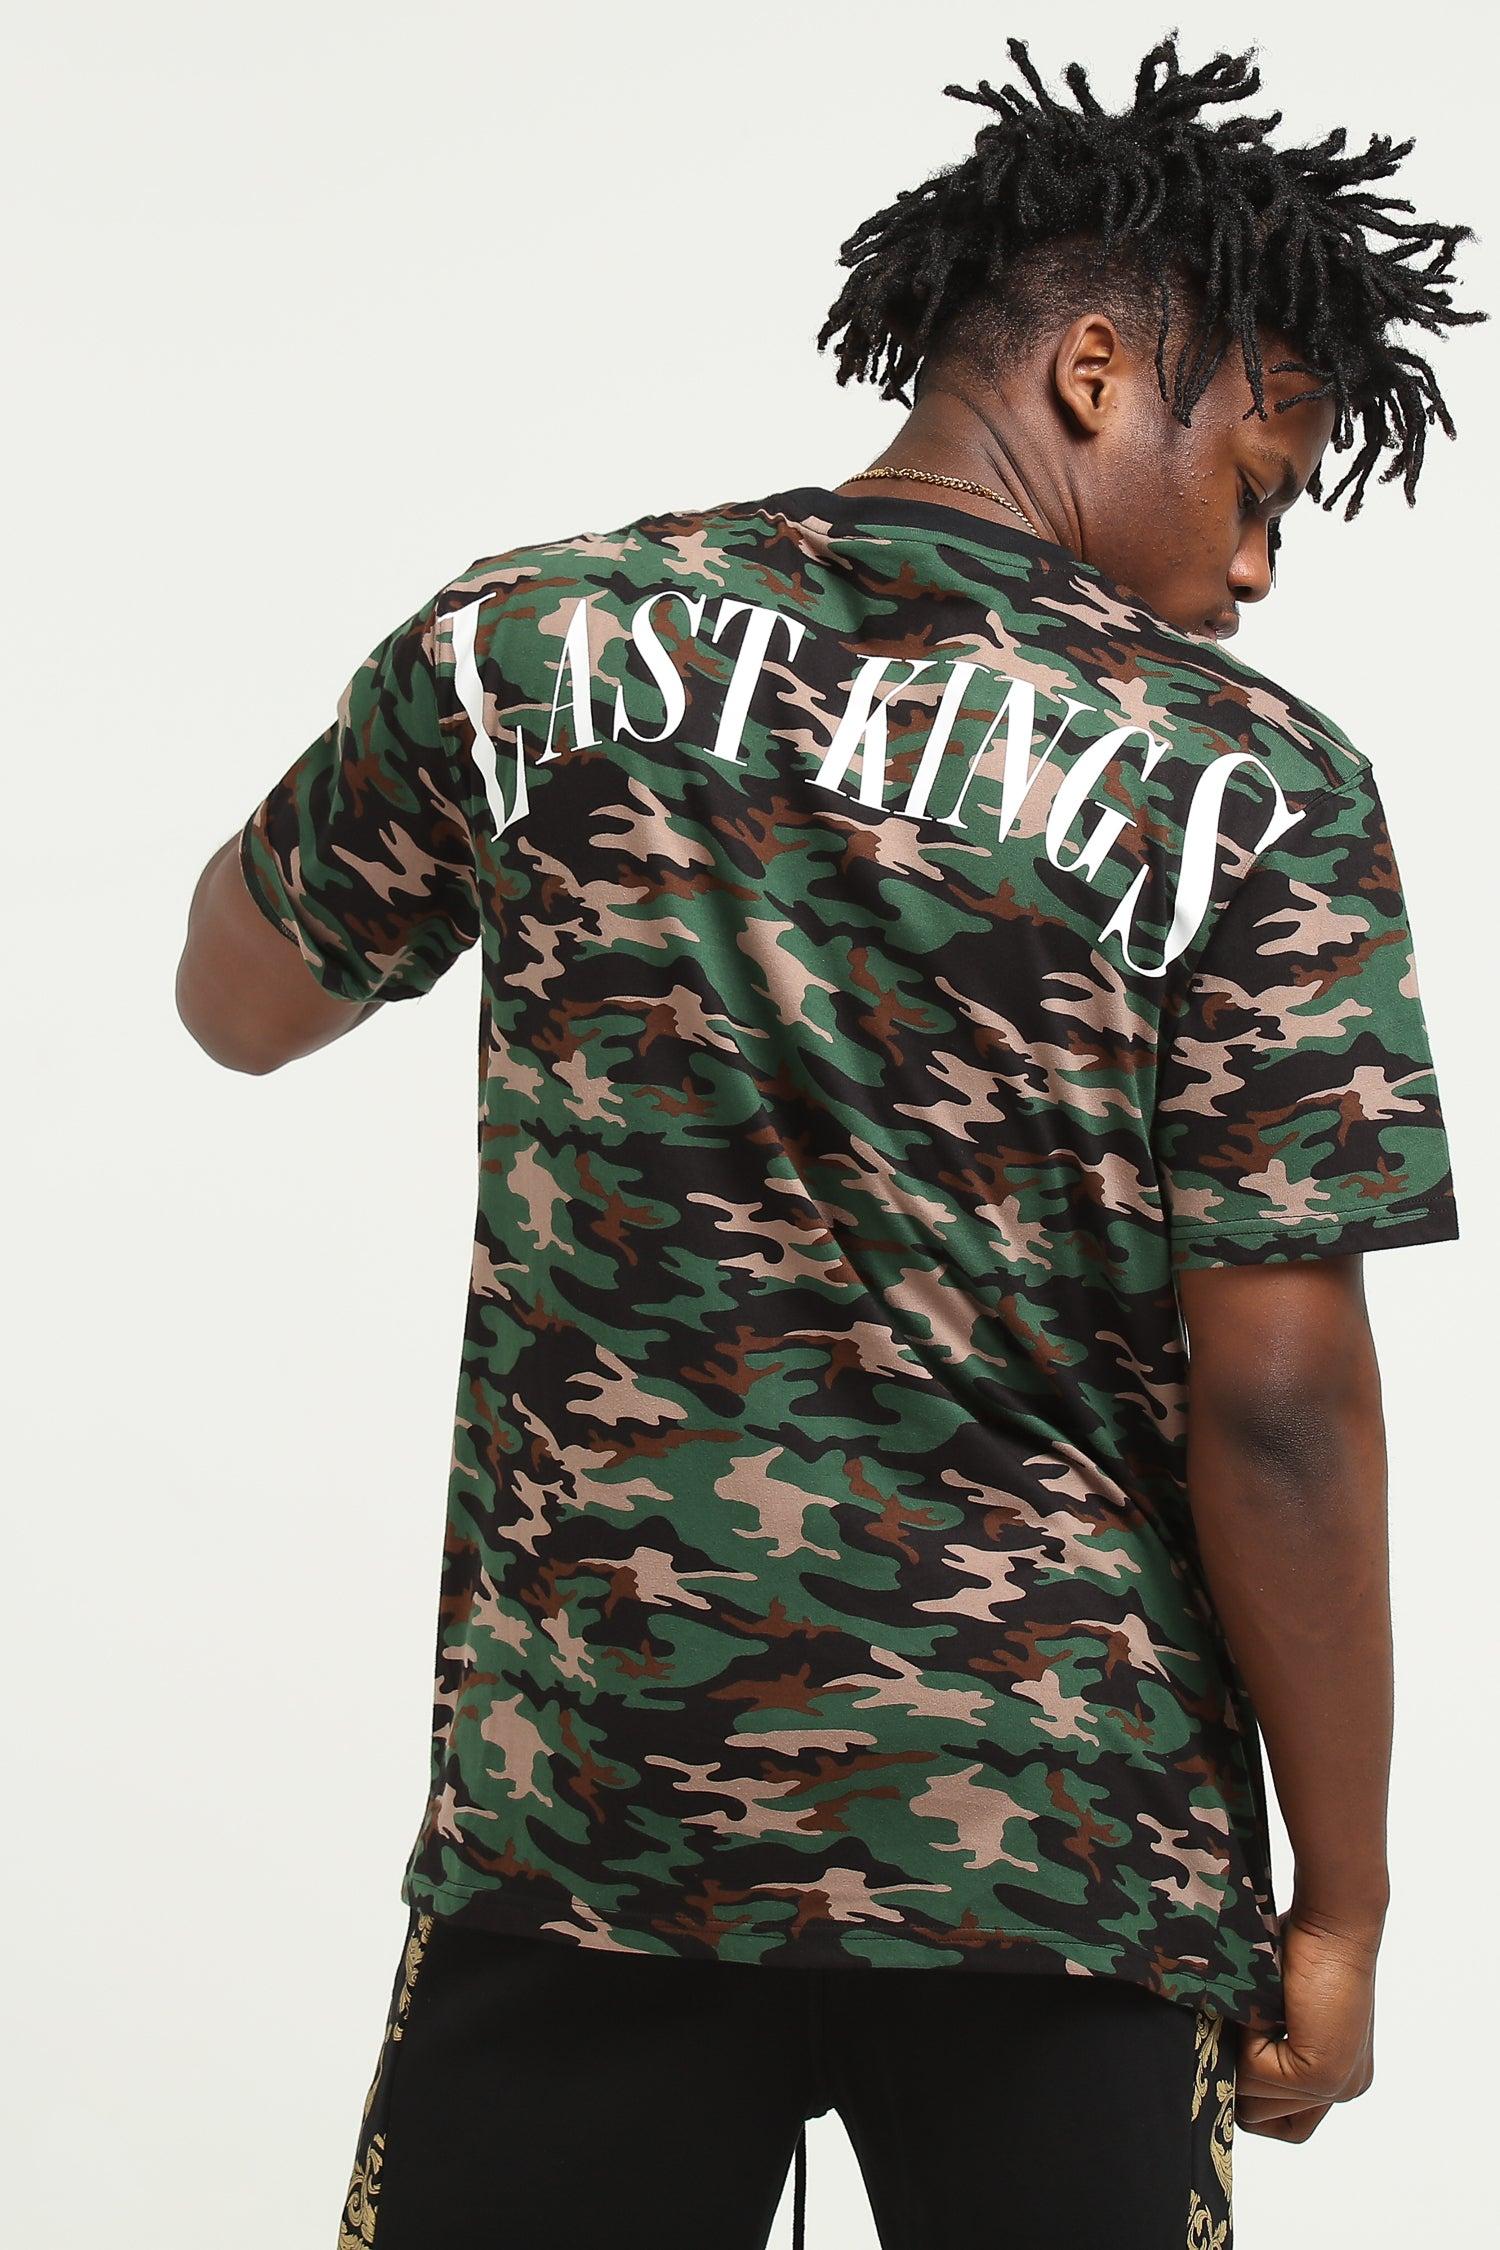 JUNIOR Woodland Camo  SIZE XS S M L XL Kids Camouflage SHORT SLEVE BOYS T-Shirt